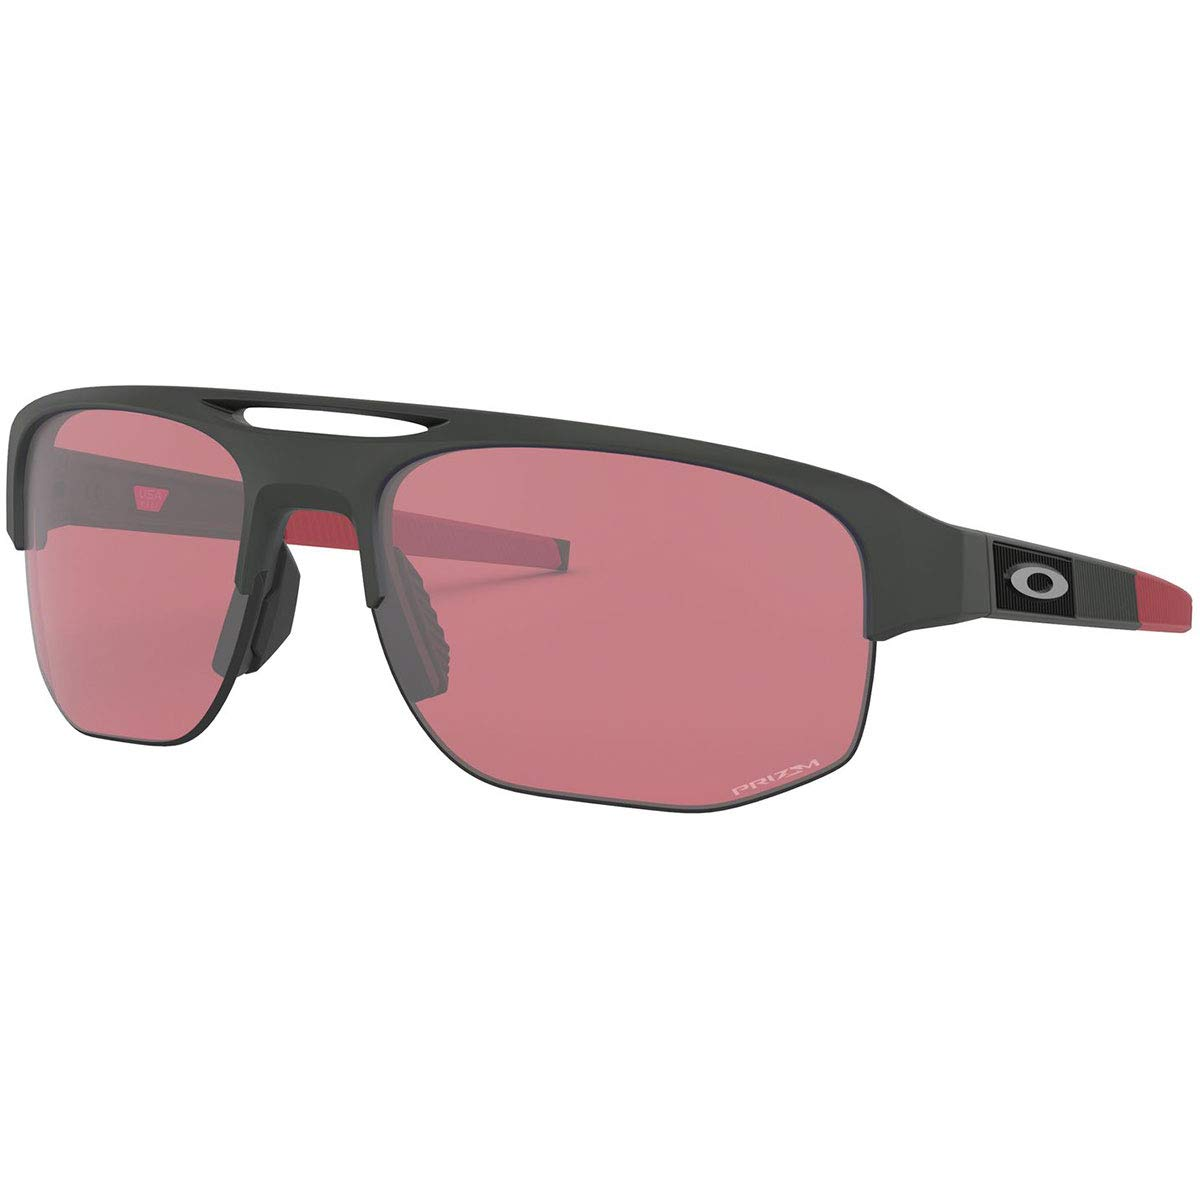 Oakley Men's OO9424 Mercenary Rectangular Sunglasses, Matte Carbon/Prizm Dark Golf, 70 mm by Oakley